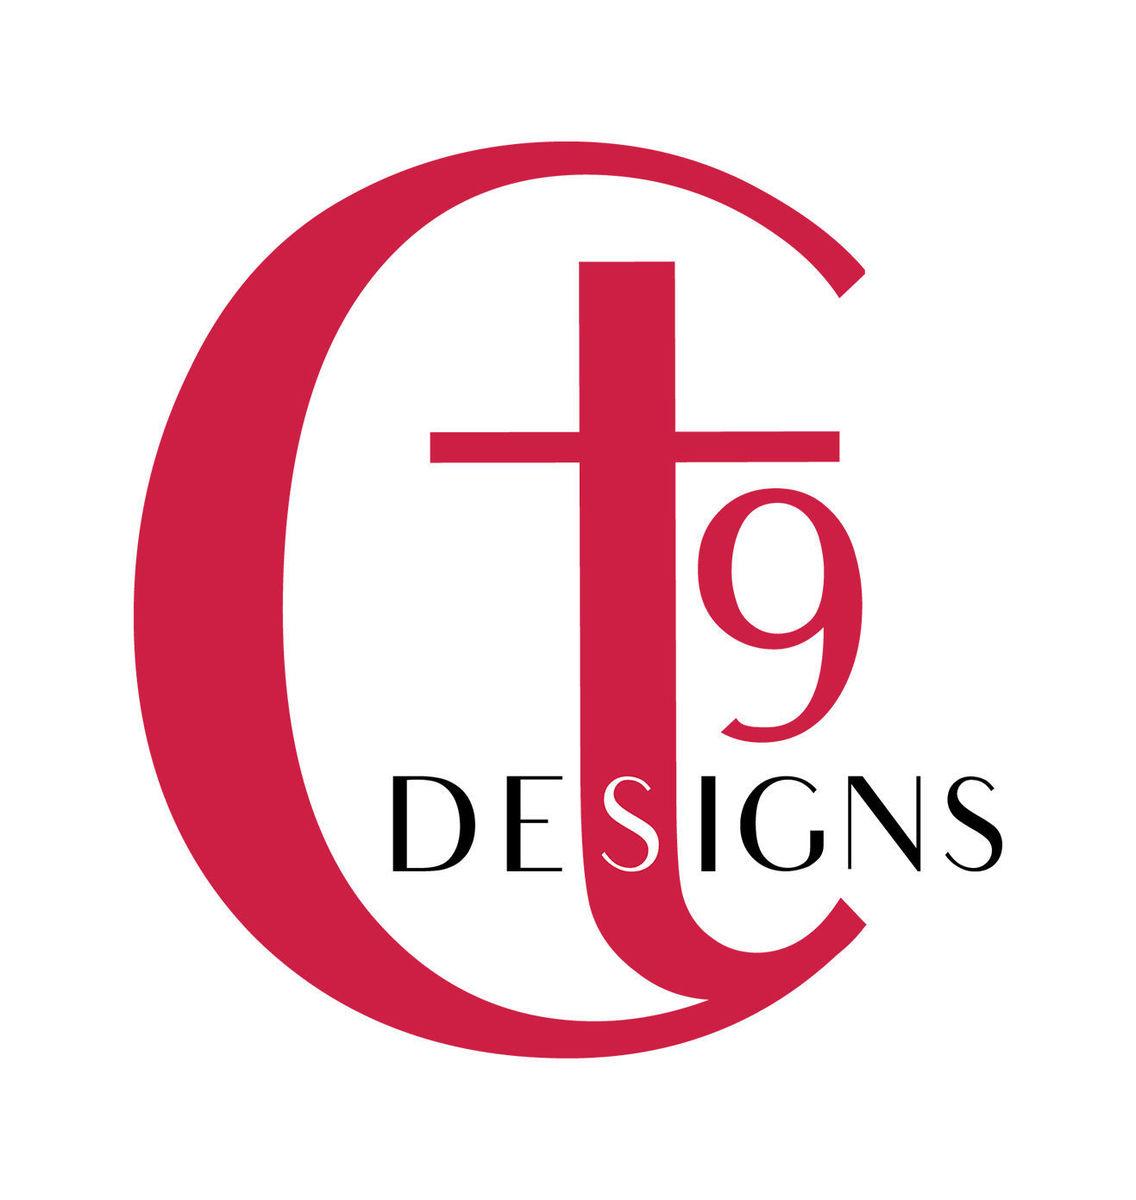 CT9 Designs - Invitations - San Antonio, TX - WeddingWire